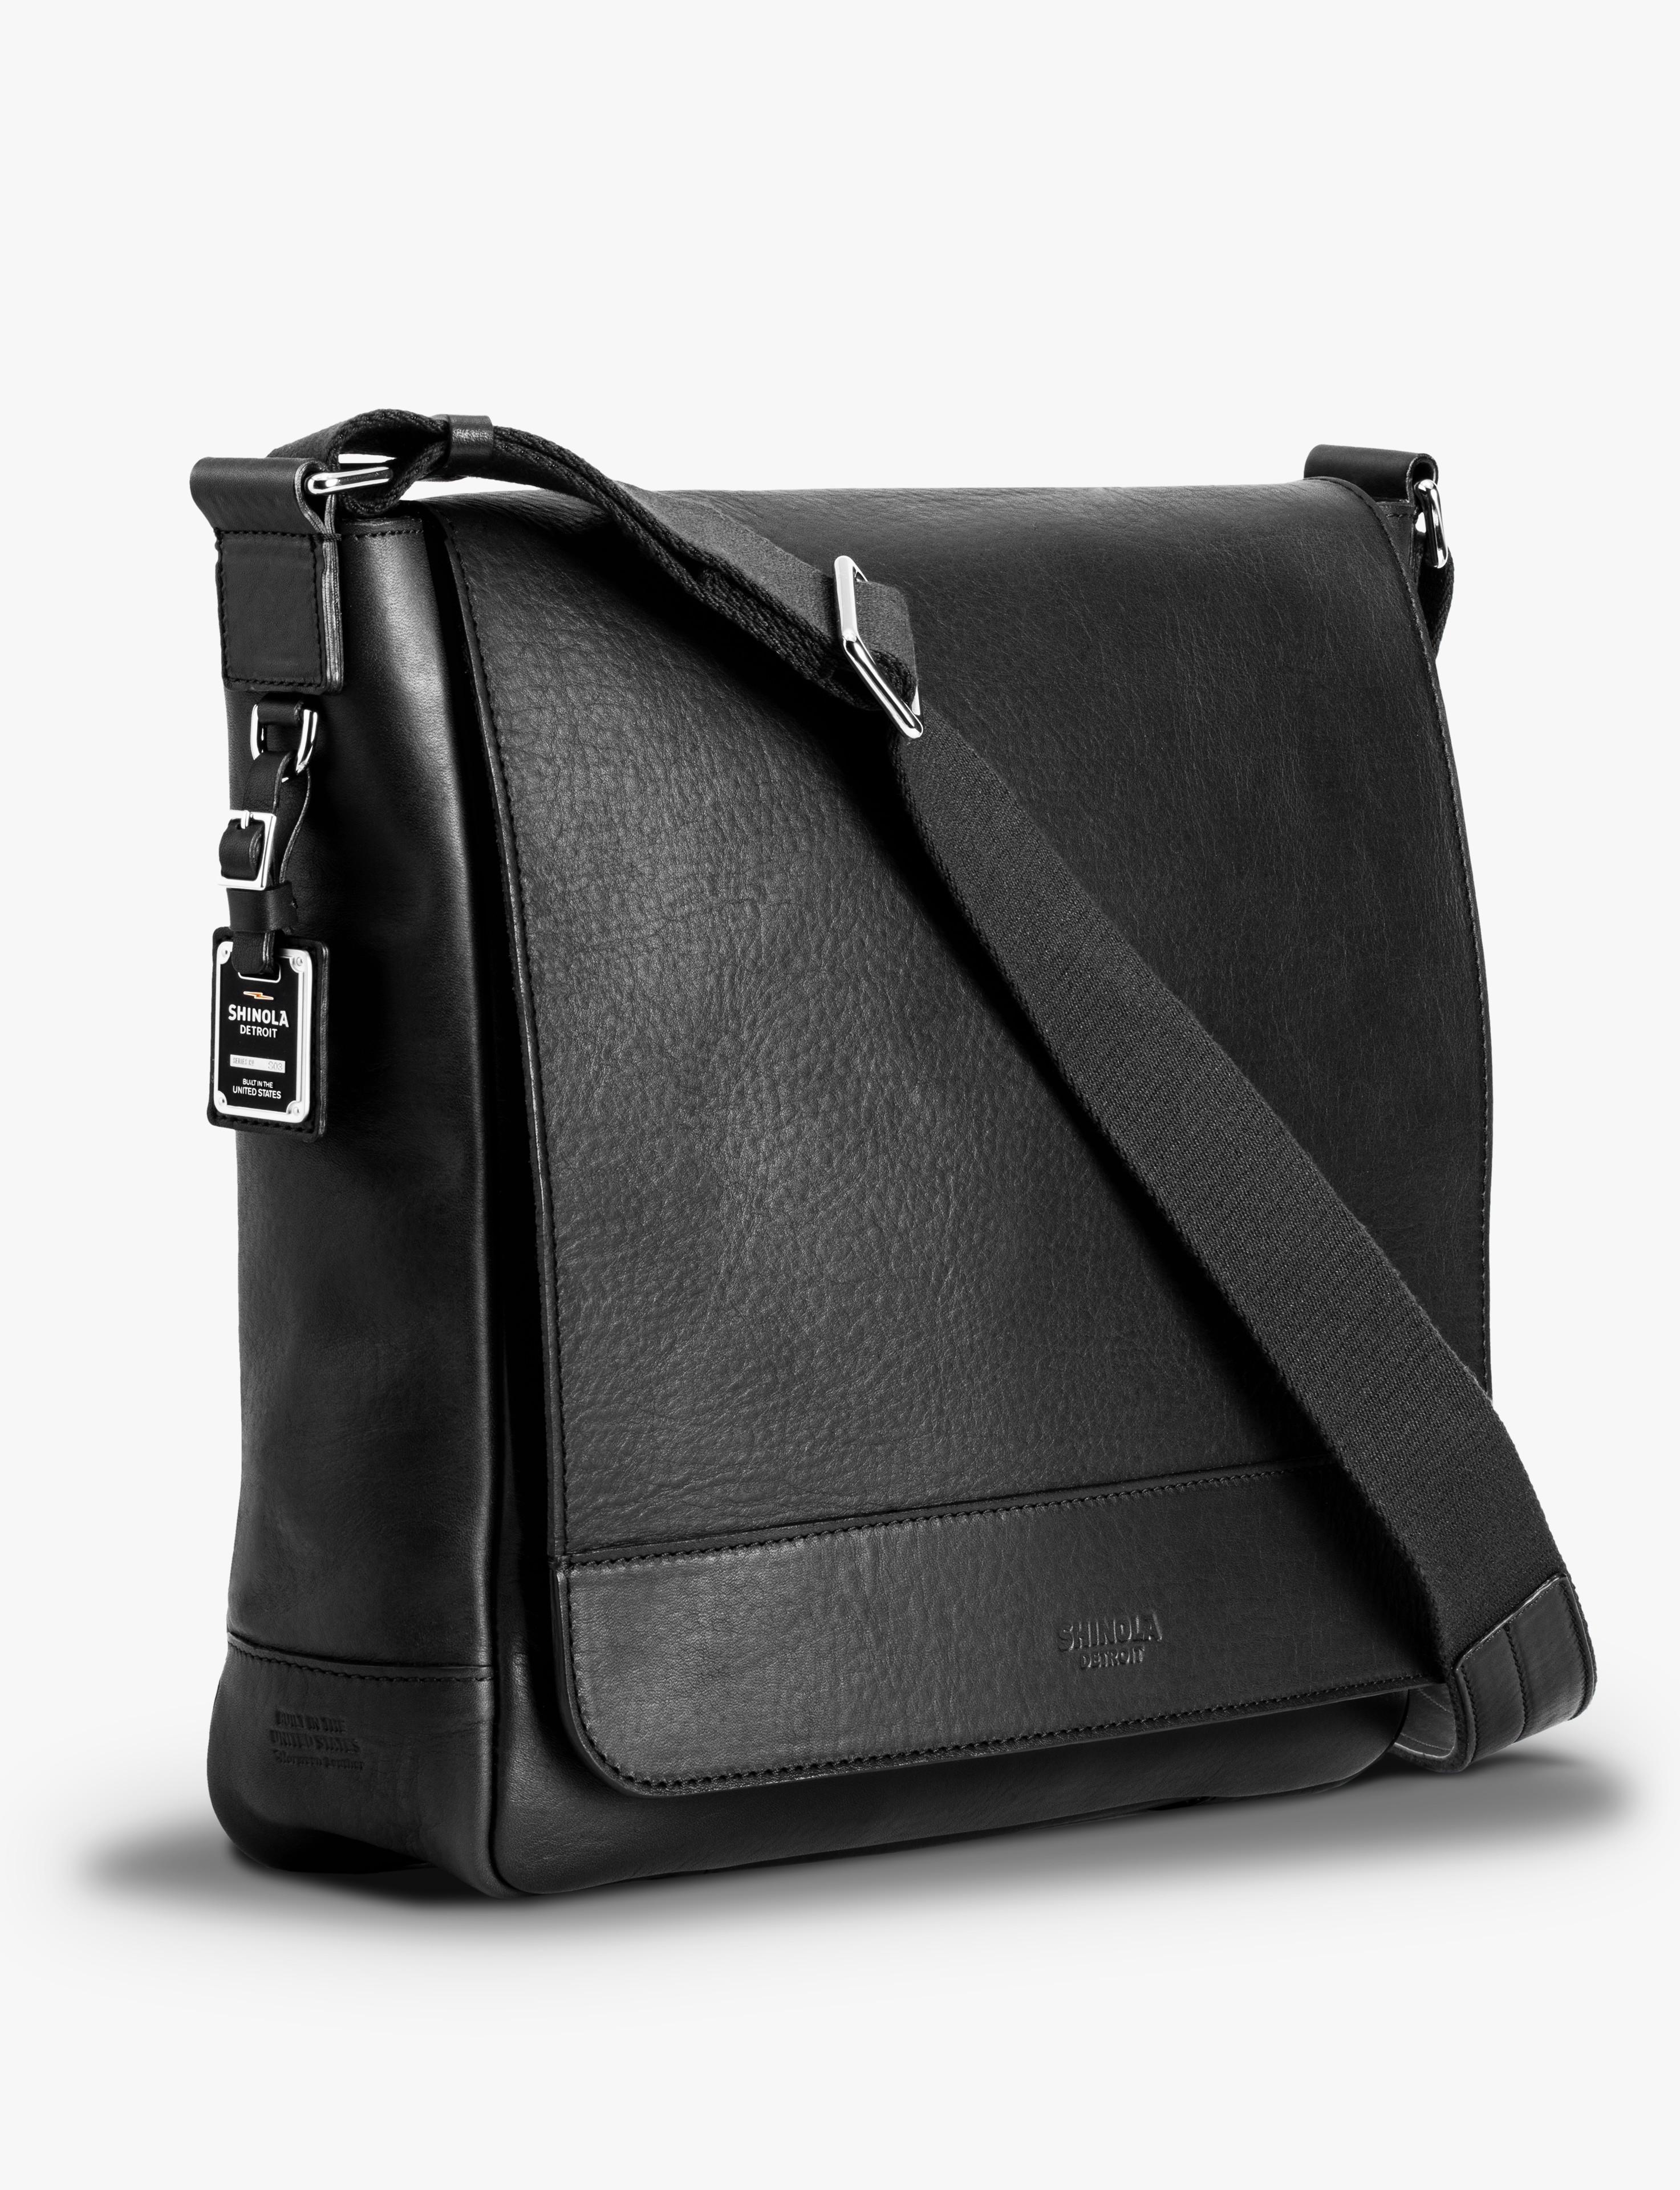 USA $695 SHINOLA Detroit North South Leather Messenger Bag in Black NEW!